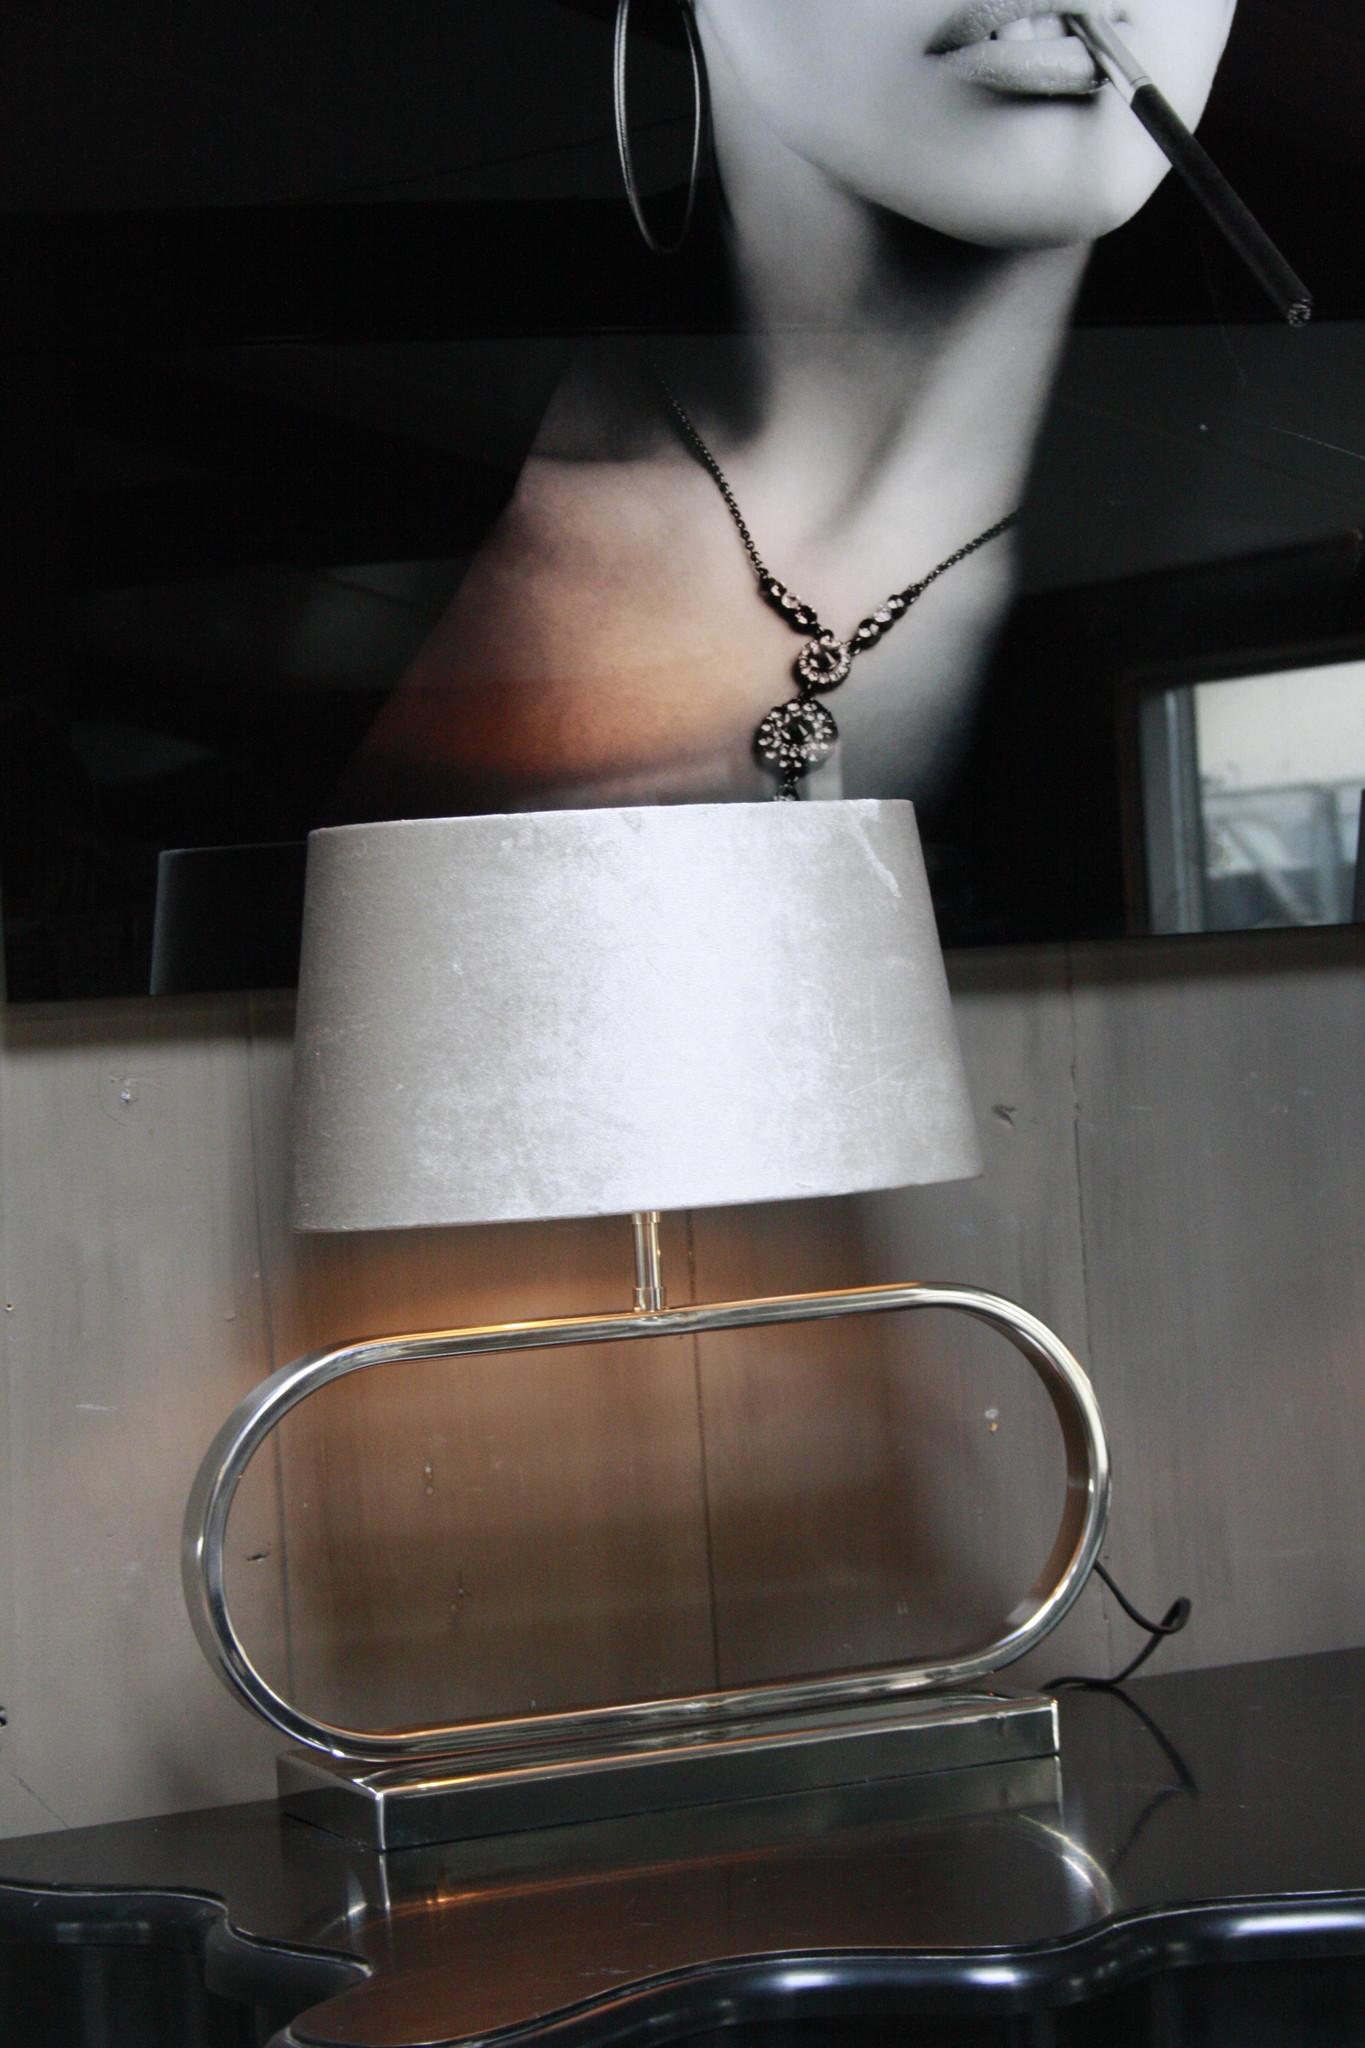 Tafellamp Ovaal RVS + Velours kap Eric Kuster Stijl-3